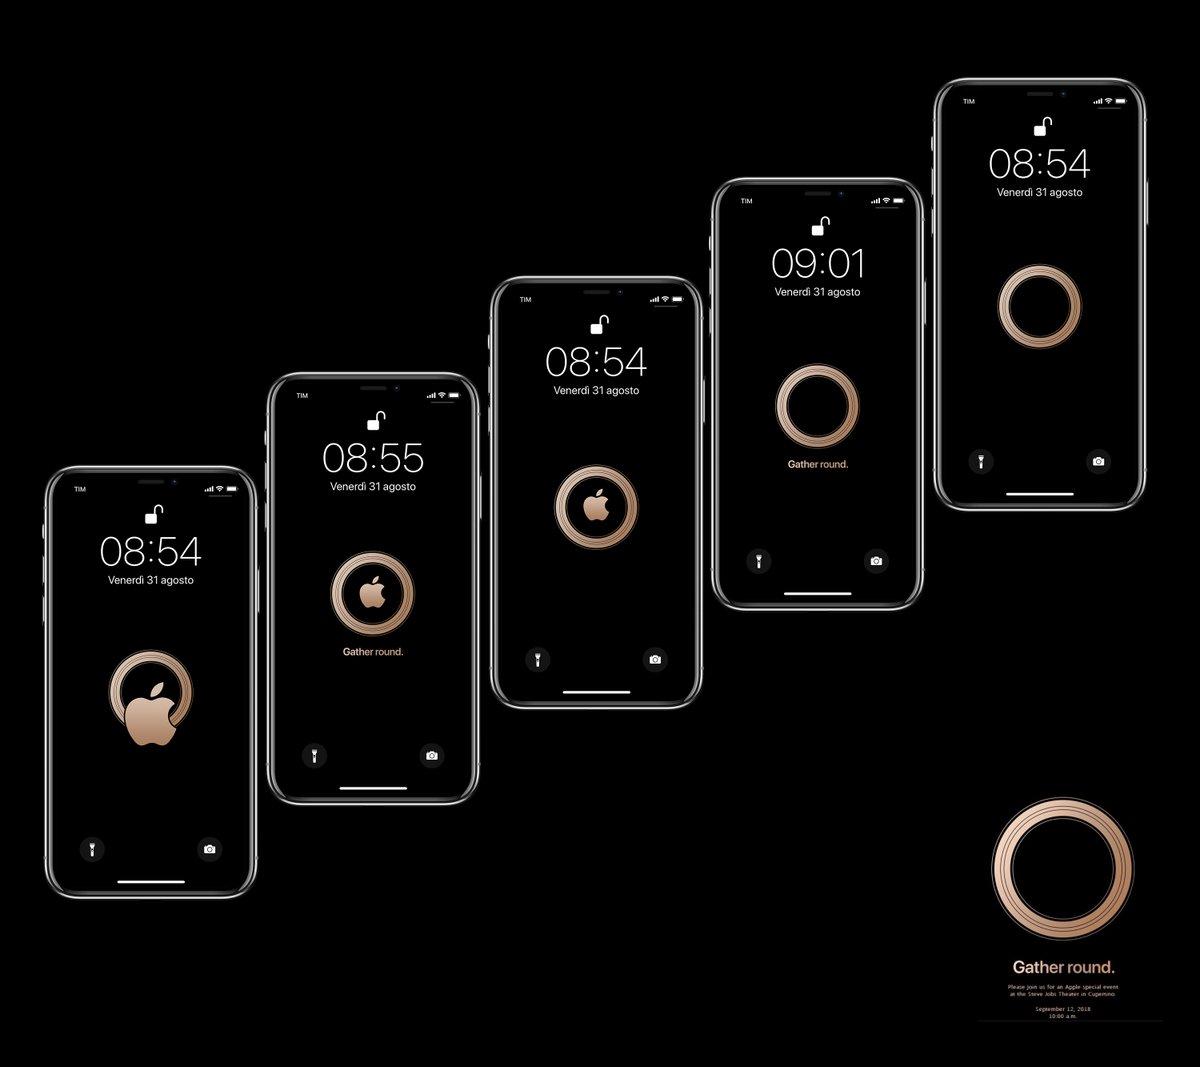 Iphone X と Iphone 用スペシャルイベント壁紙が公開 私設apple